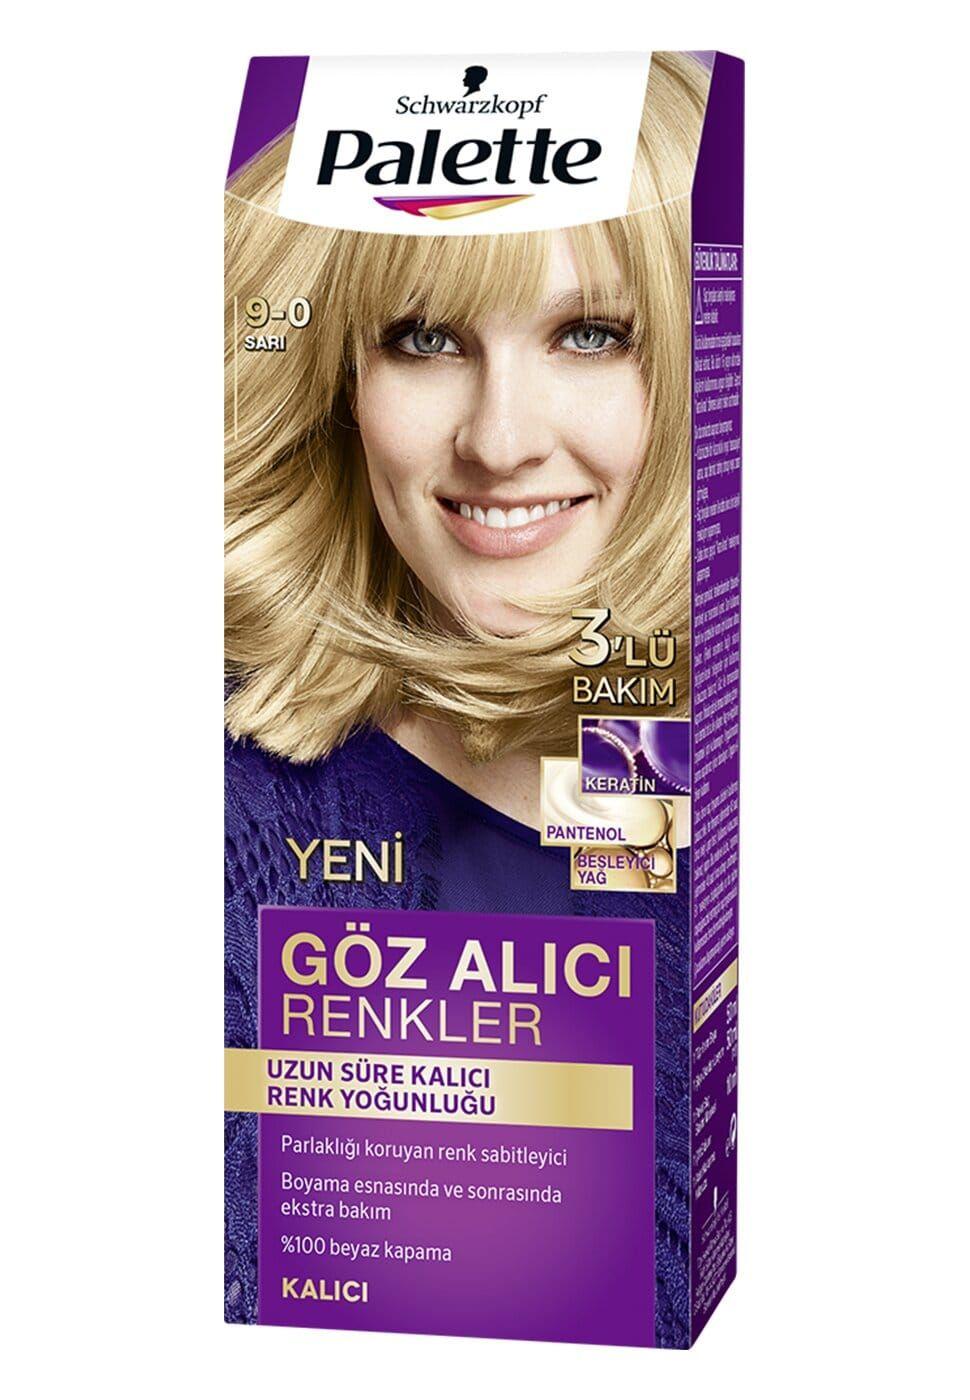 Schwarzkopf Palette Yogun Goz Alici Renkler Sac Boyasi 9 0 Sari